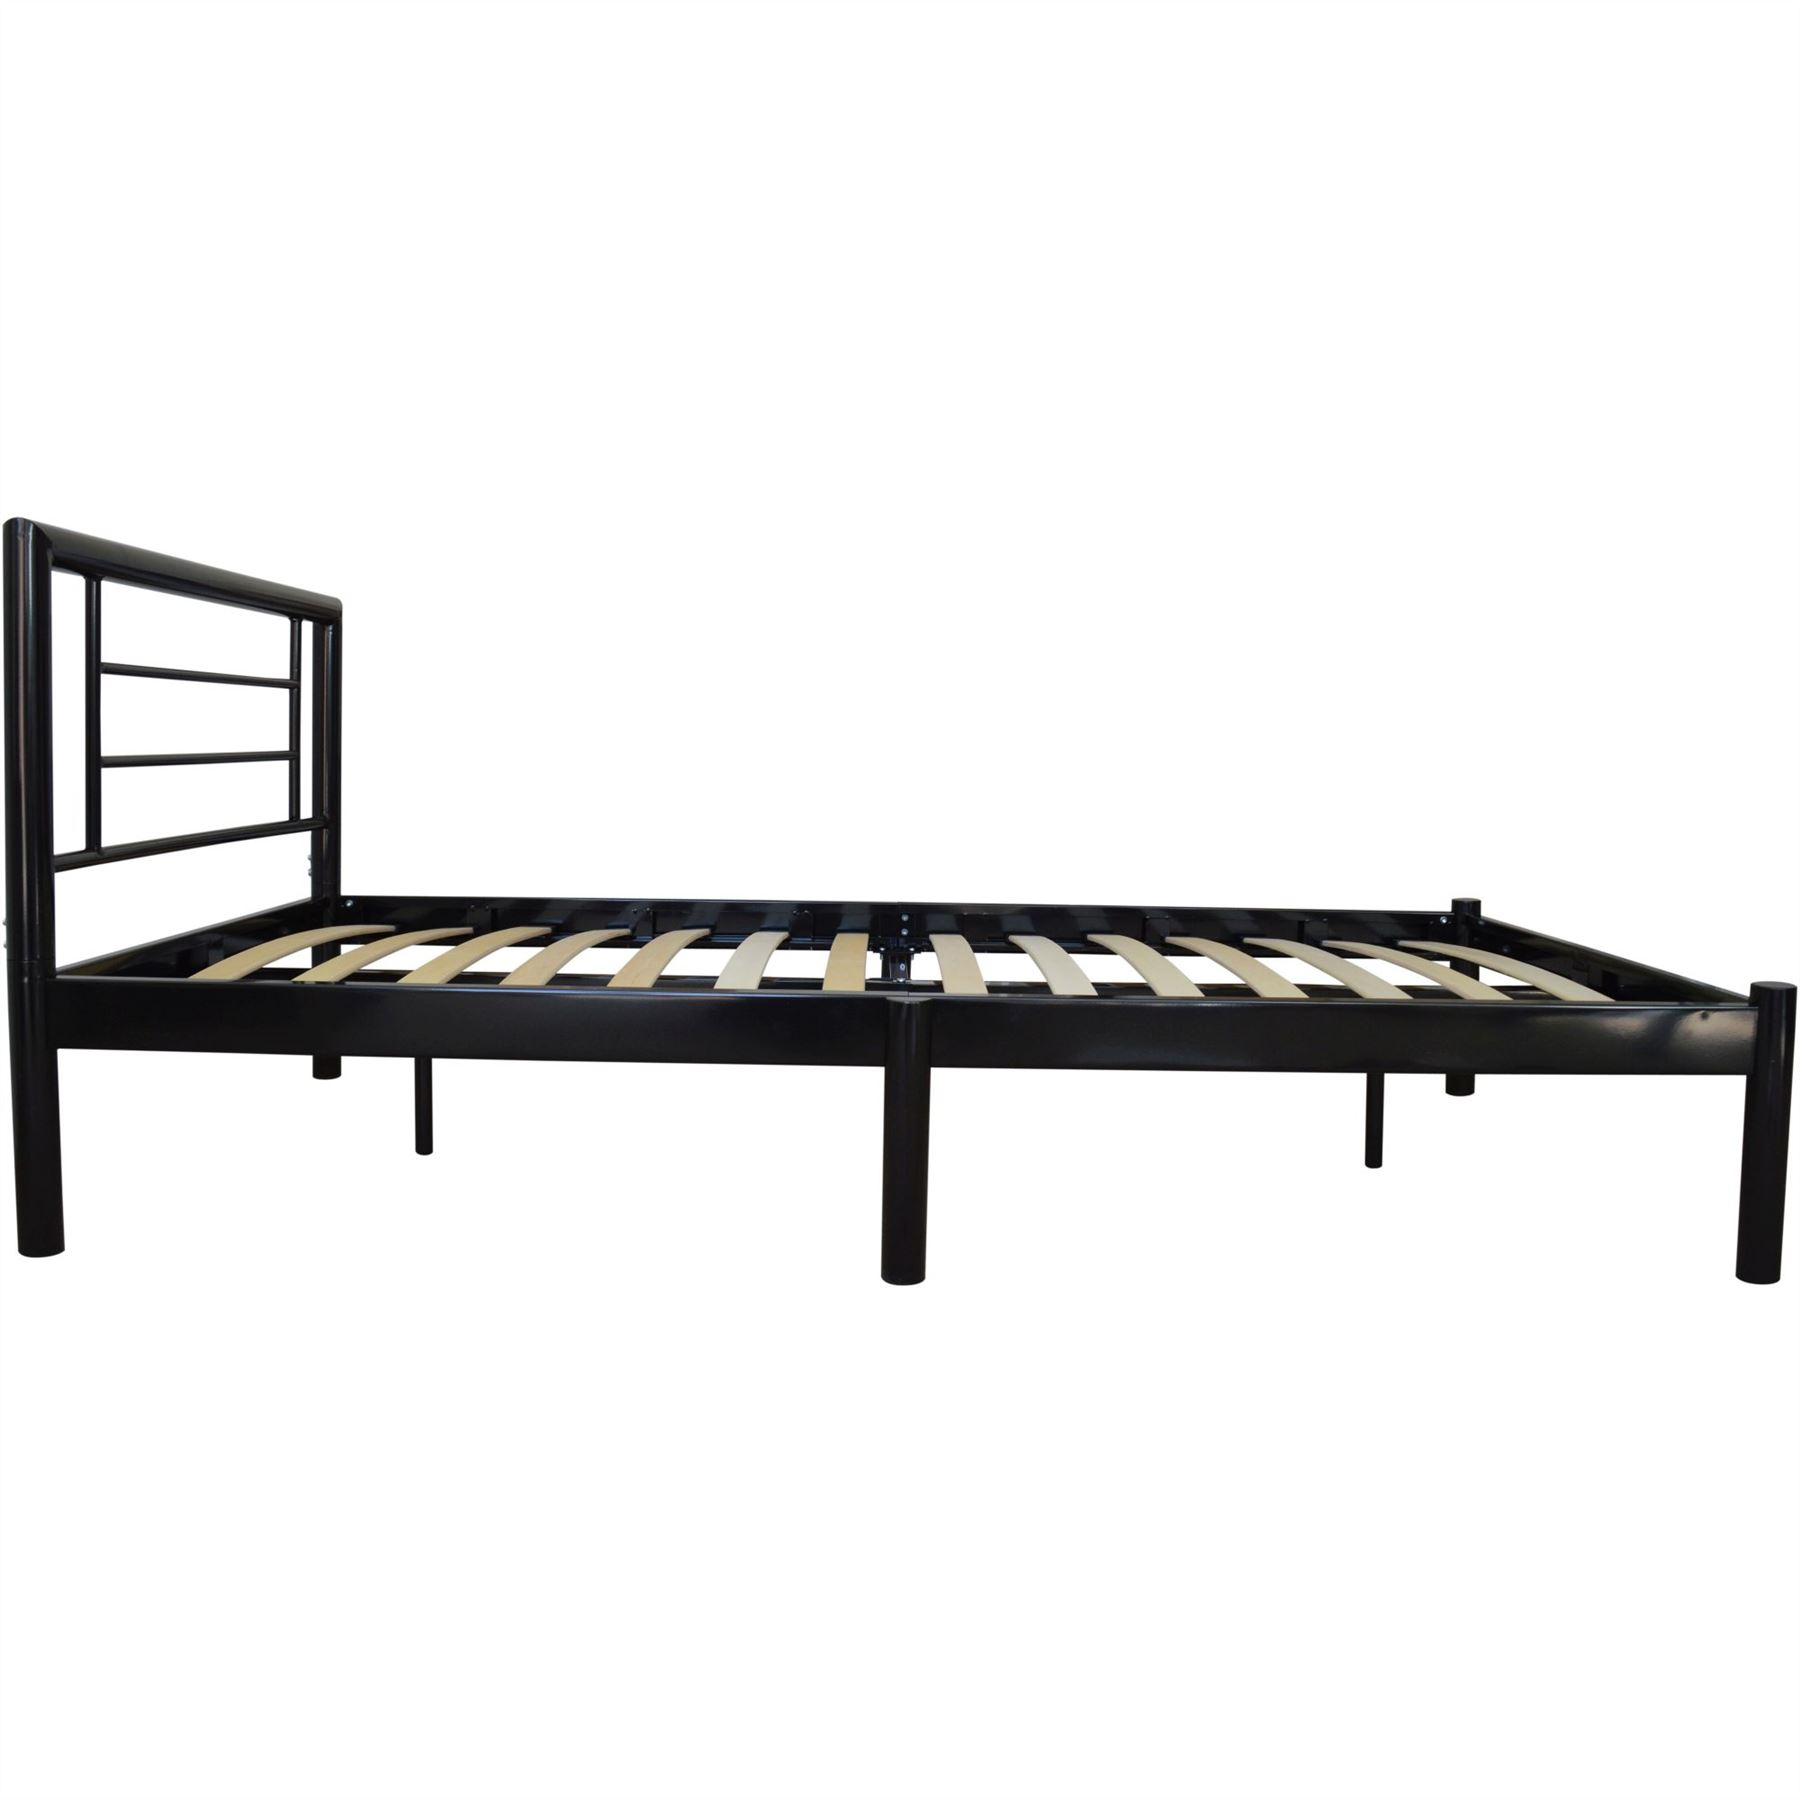 Single Metal Bed Frame Strong Wooden Slats In Black